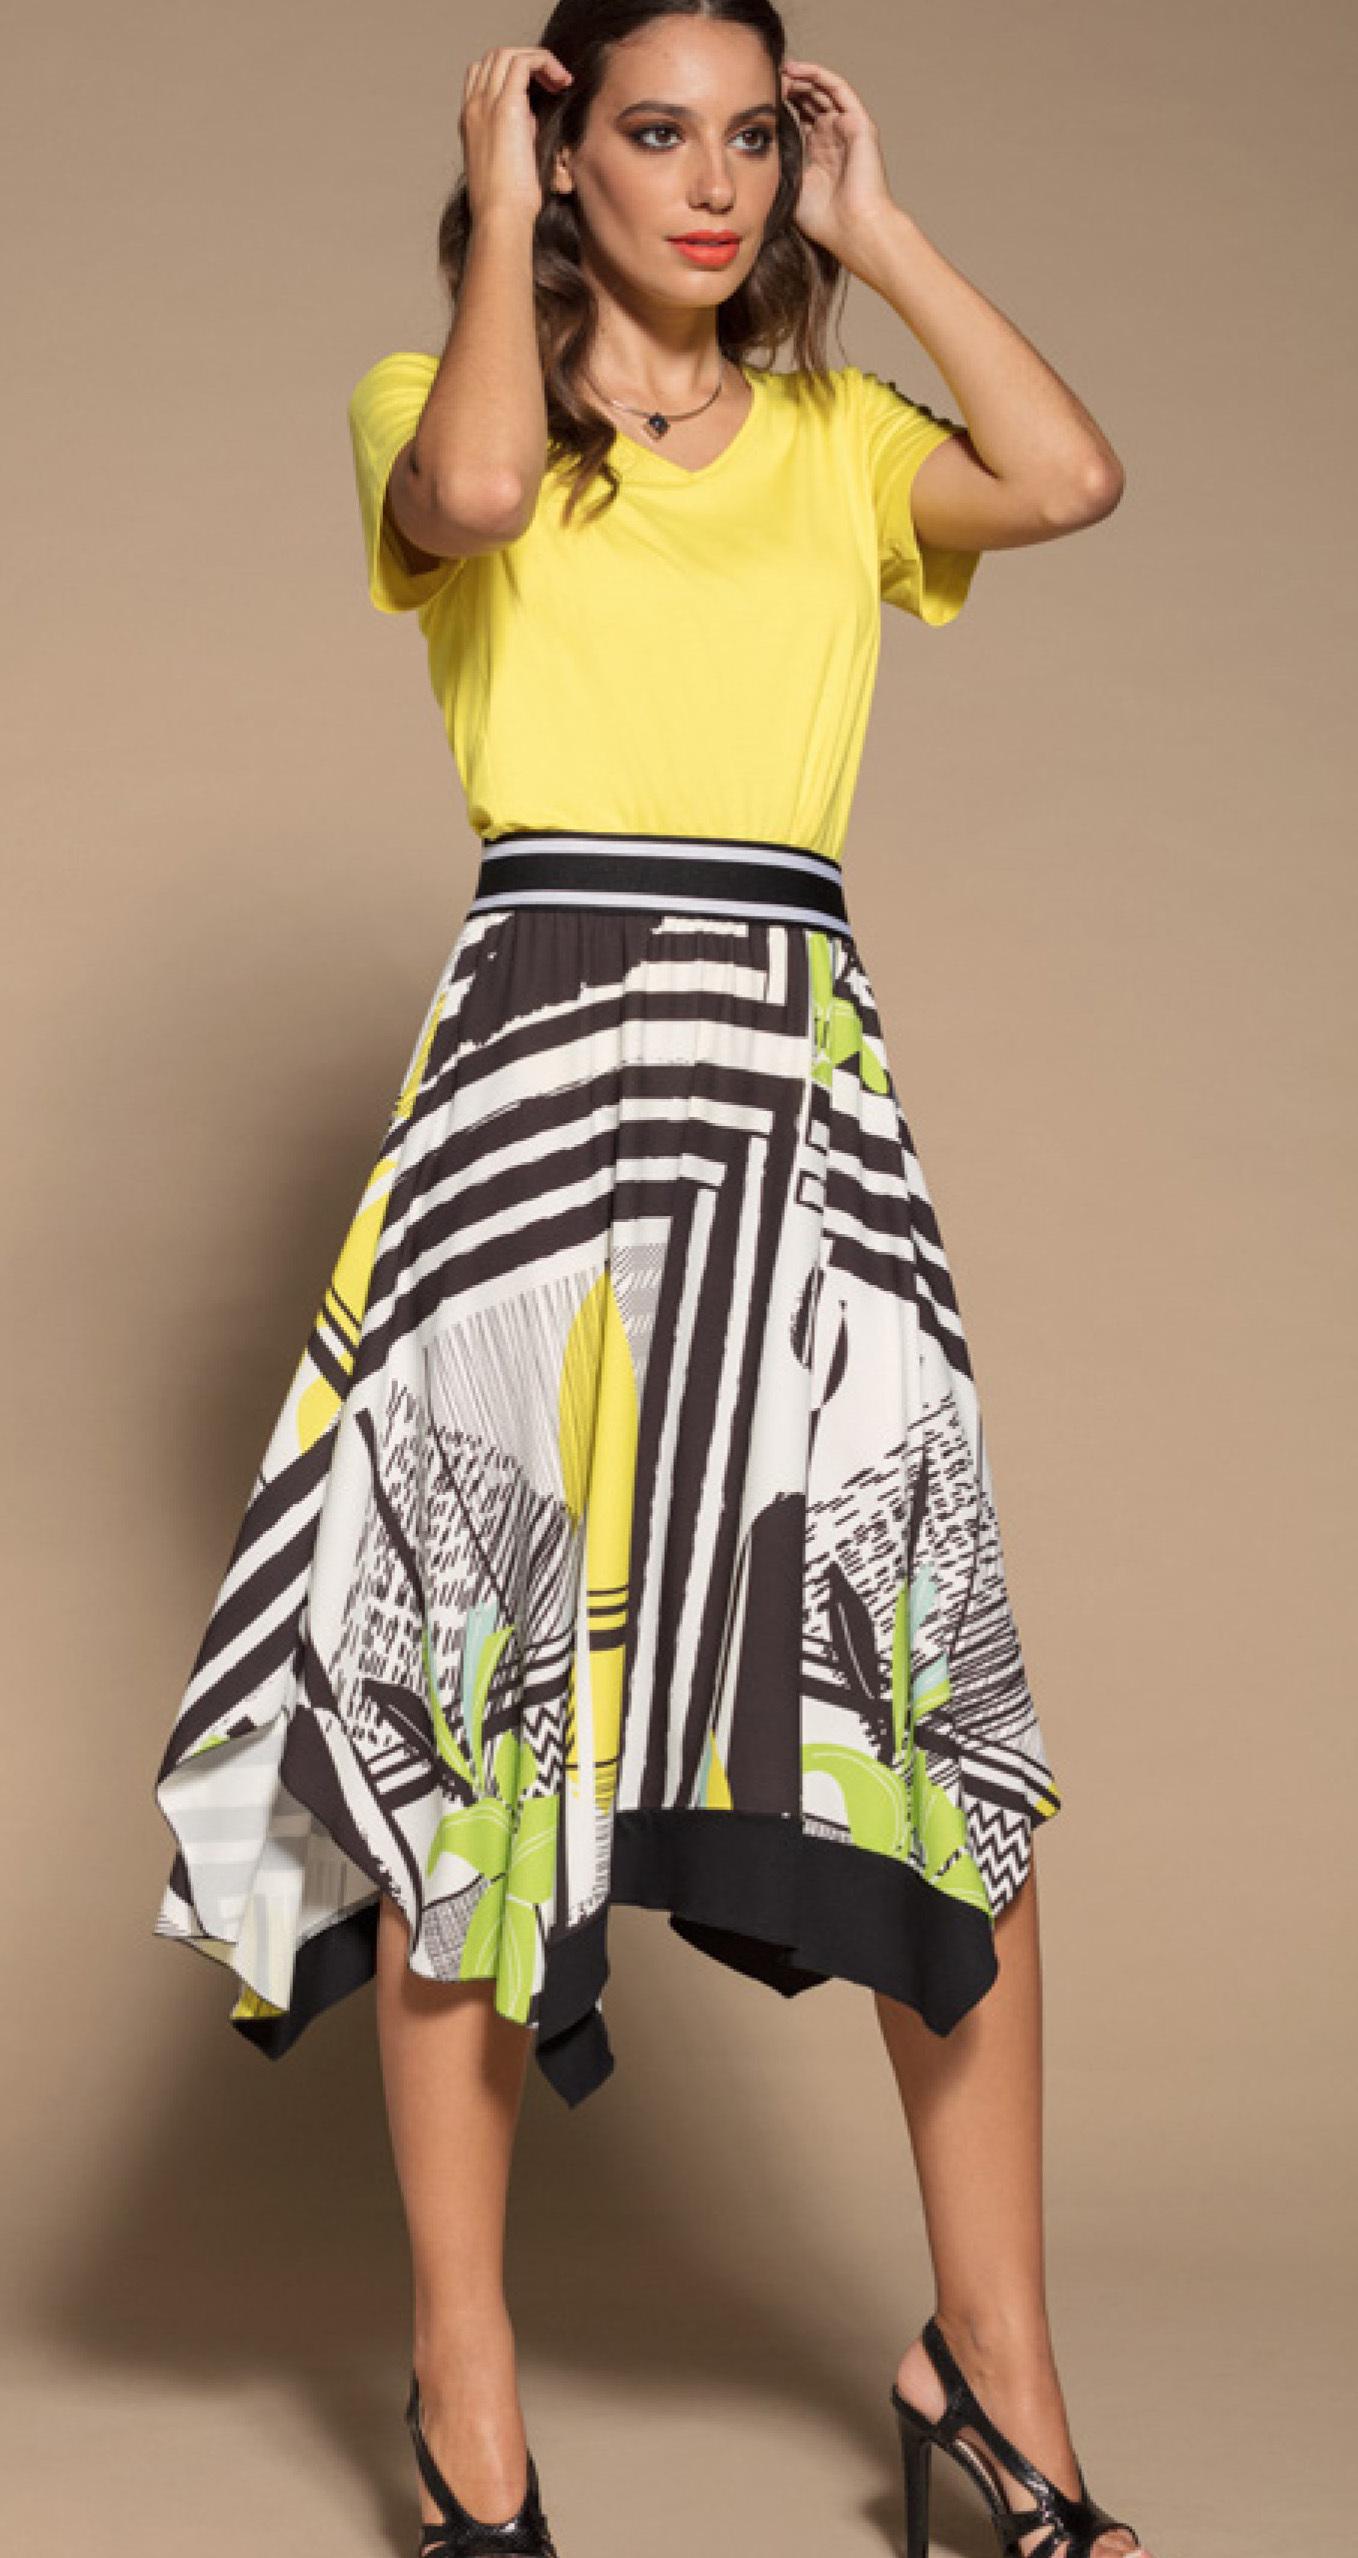 Maloka: Lemon Lime Marble High Waisted Asymmetrical Midi Skirt